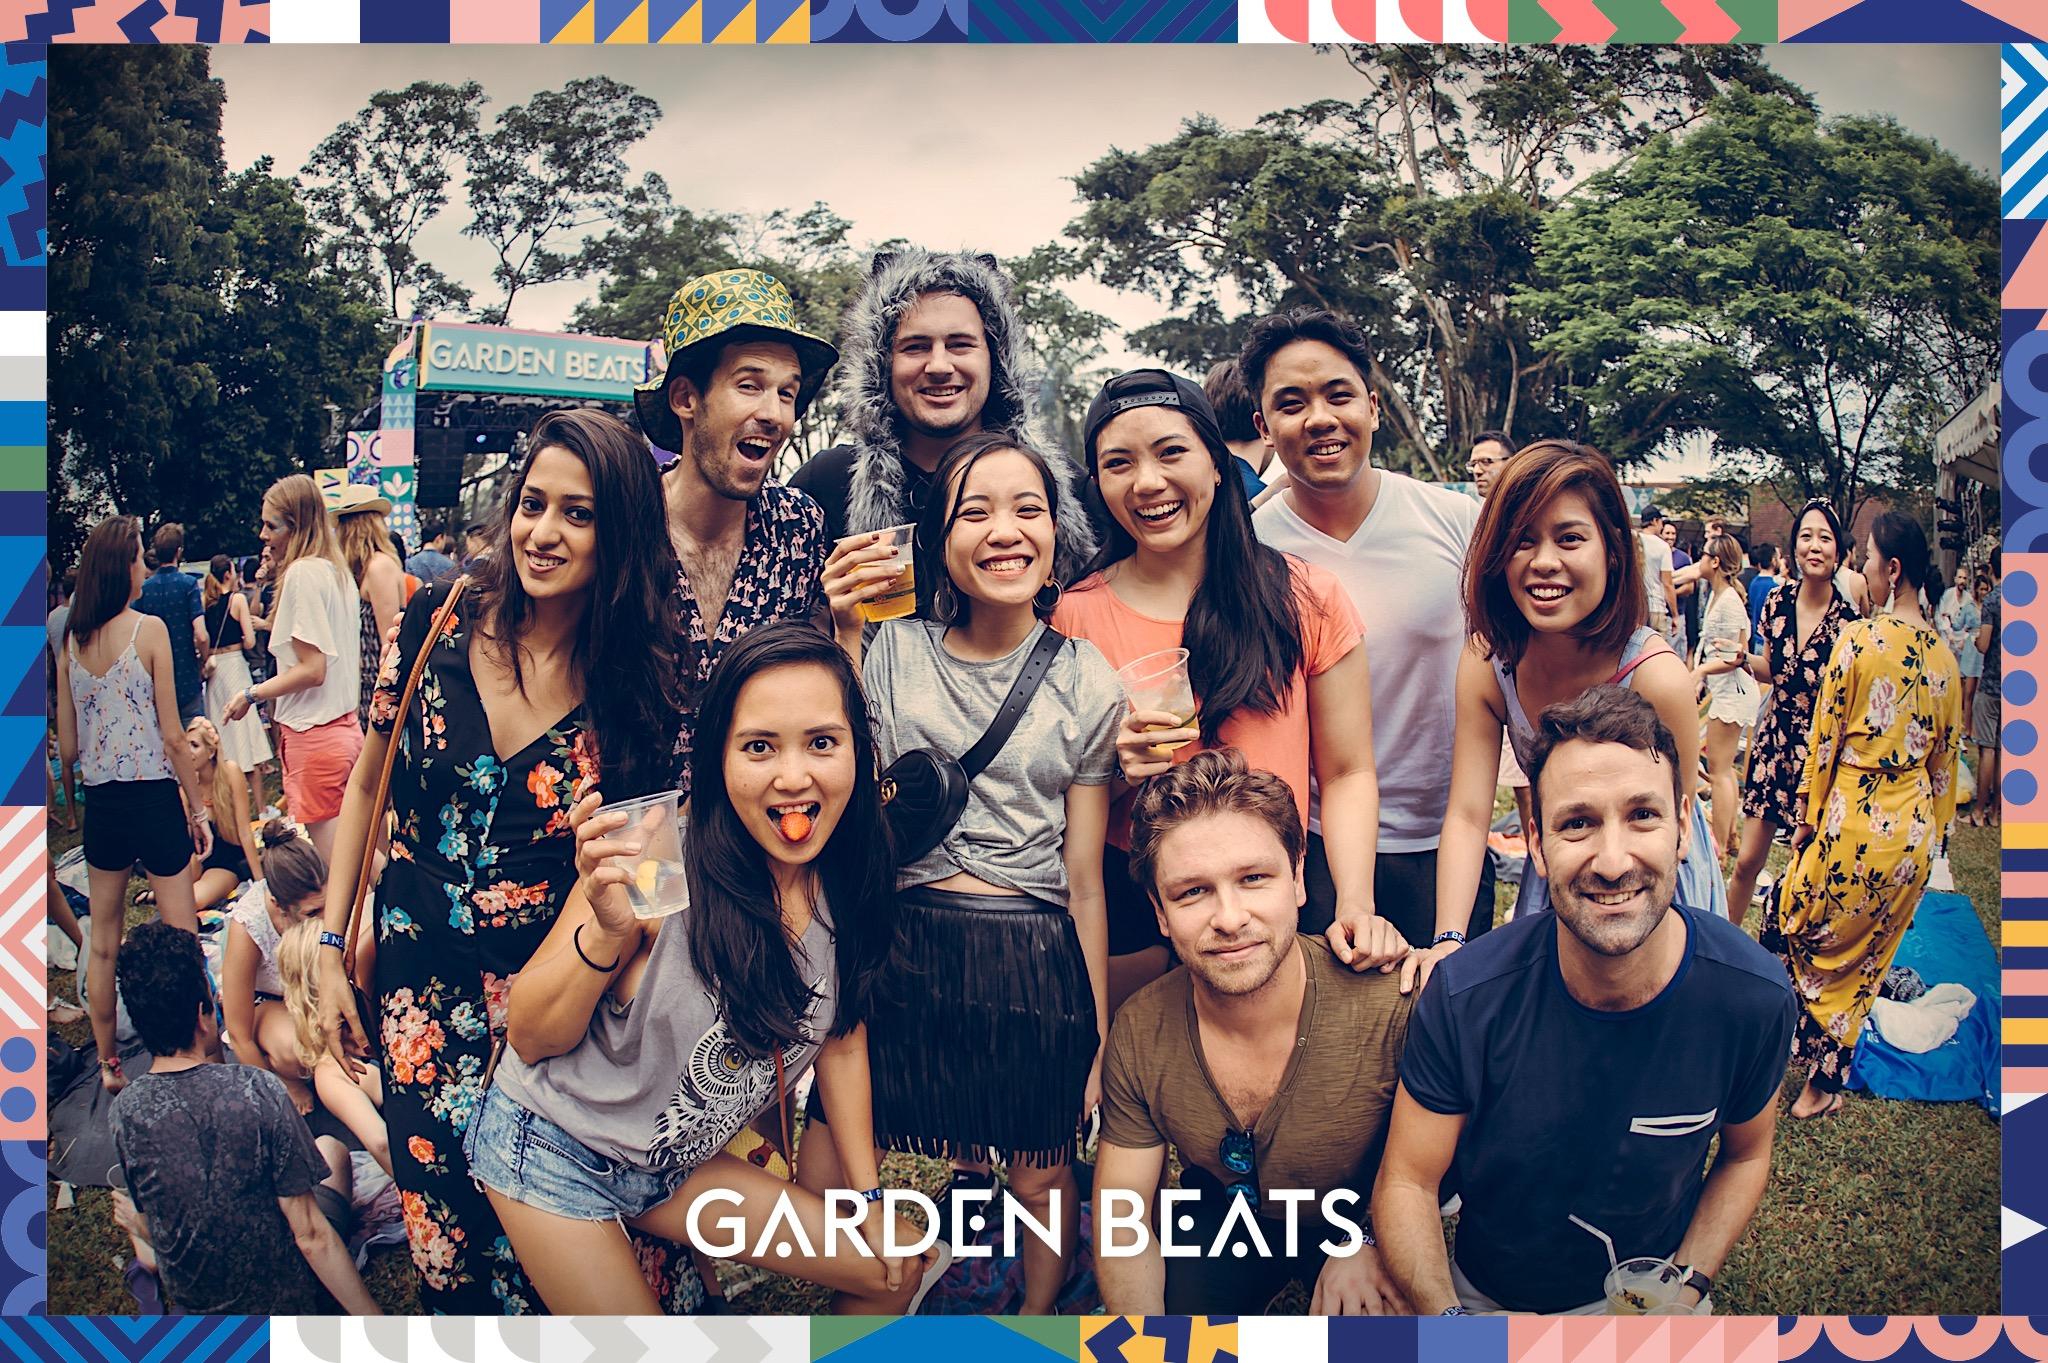 03032018_GardenBeats_Colossal595_Watermarked.jpg